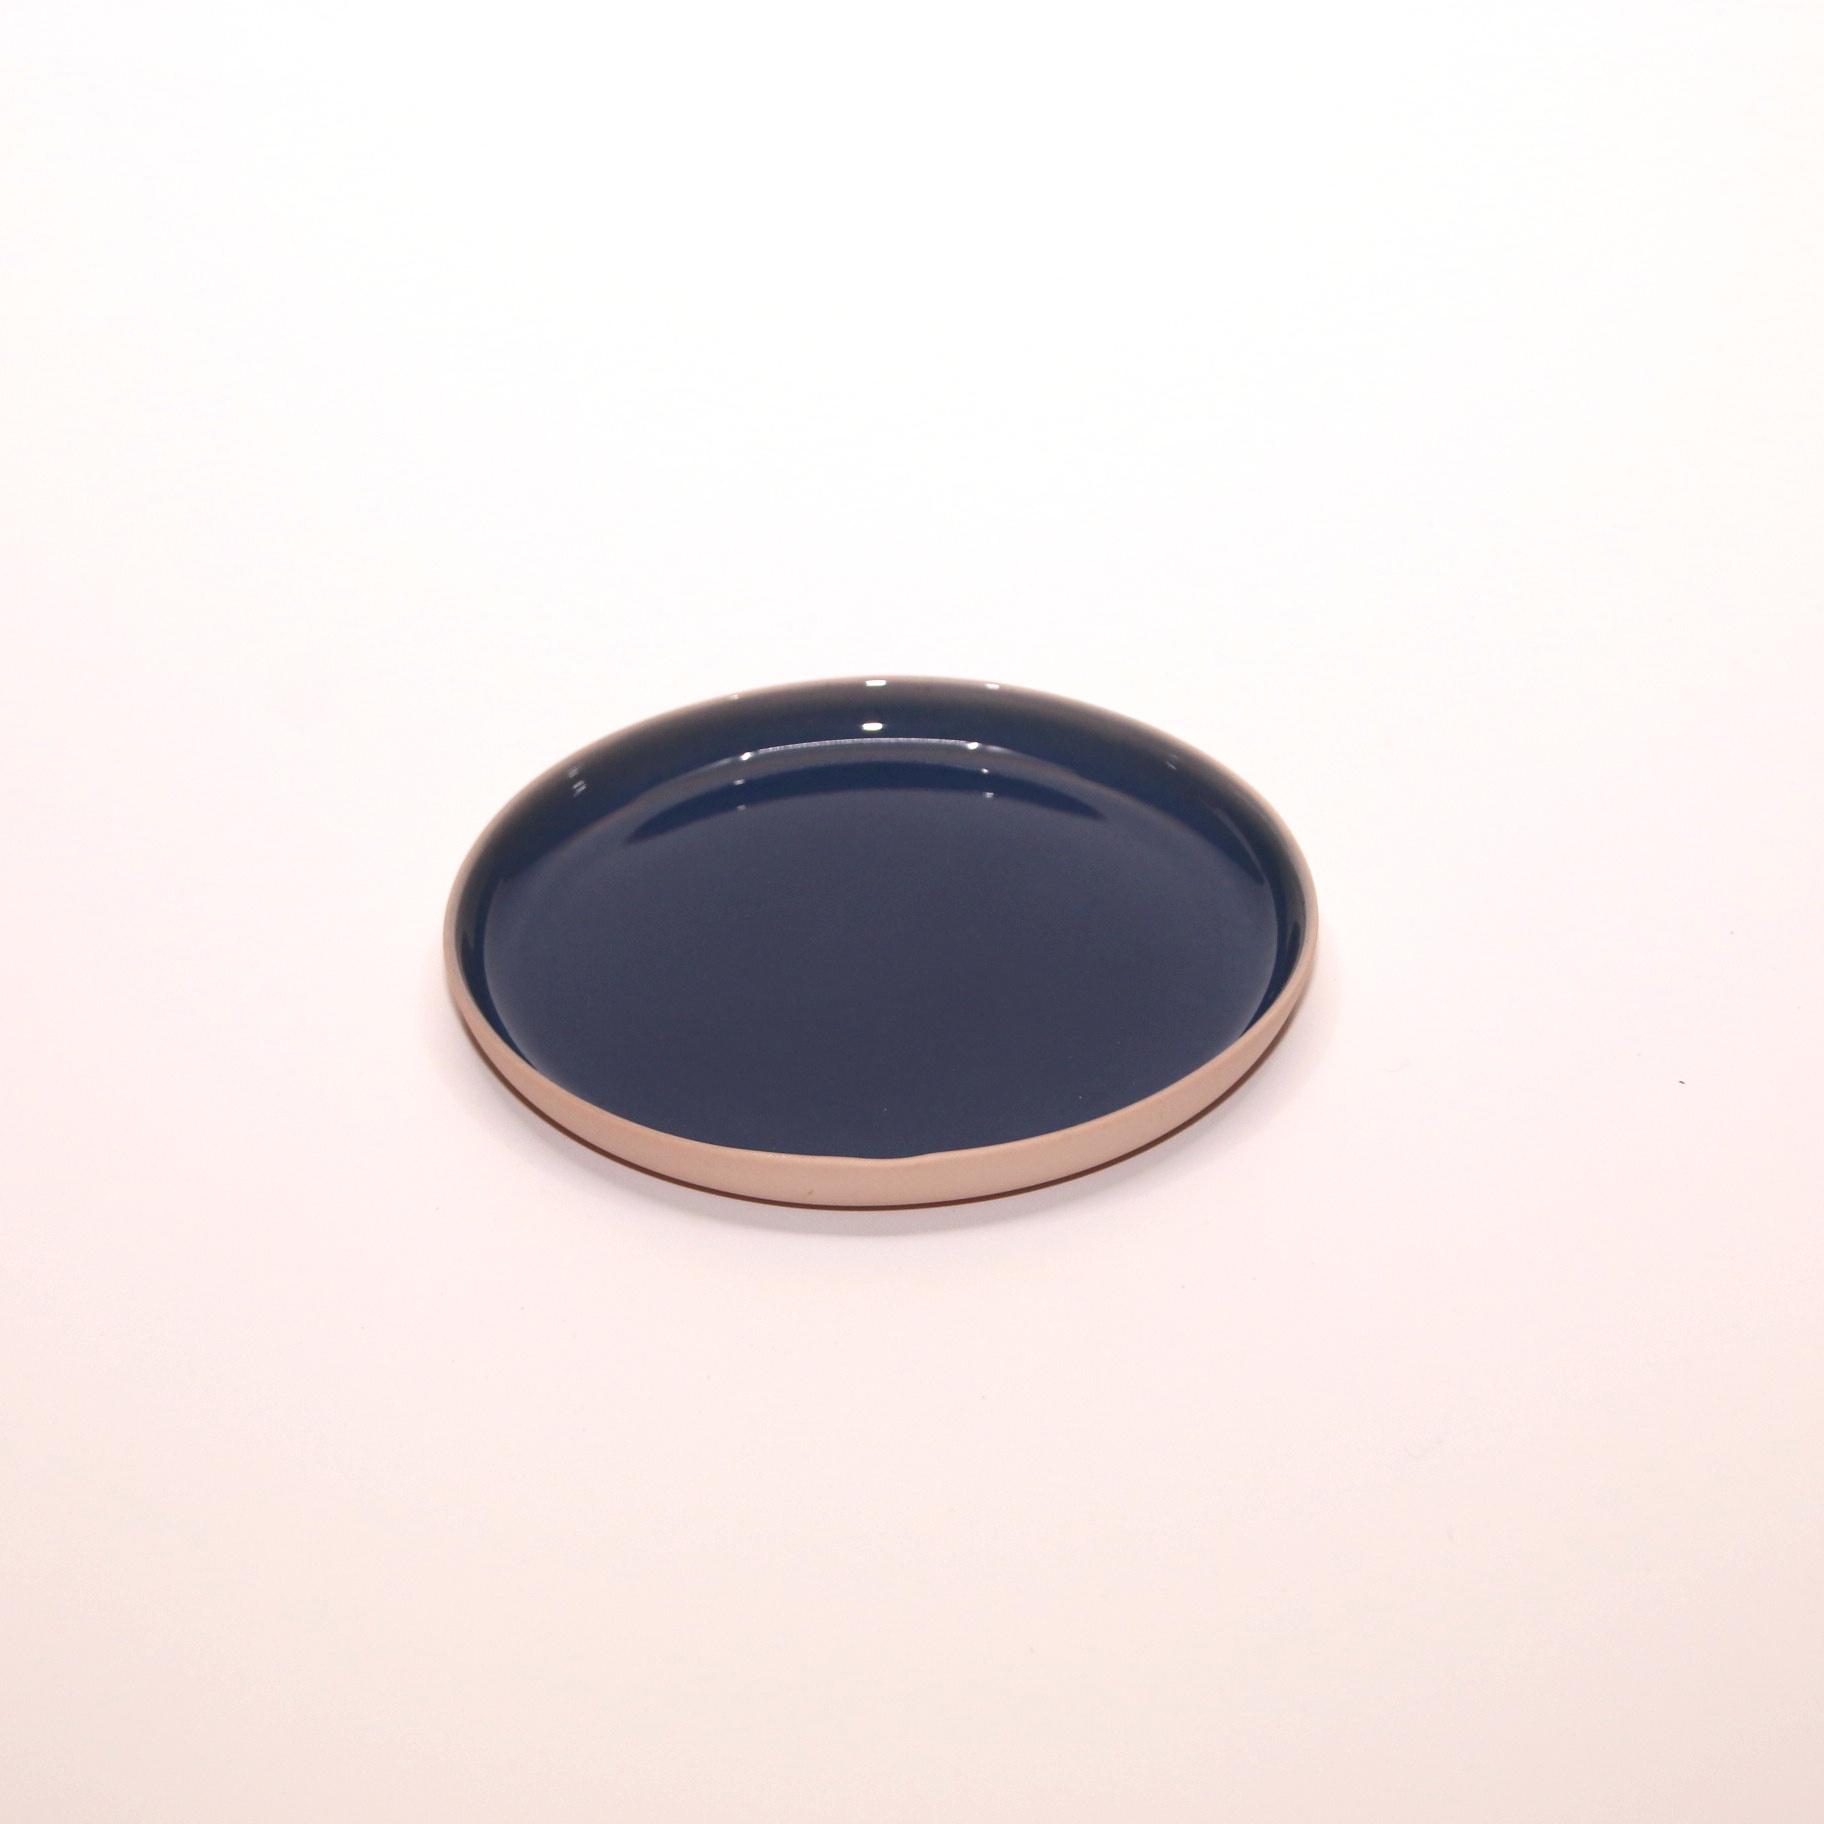 Grace of Glaze Porseleinen bordje blauw/lichtroze - GRACE of  GLAZE